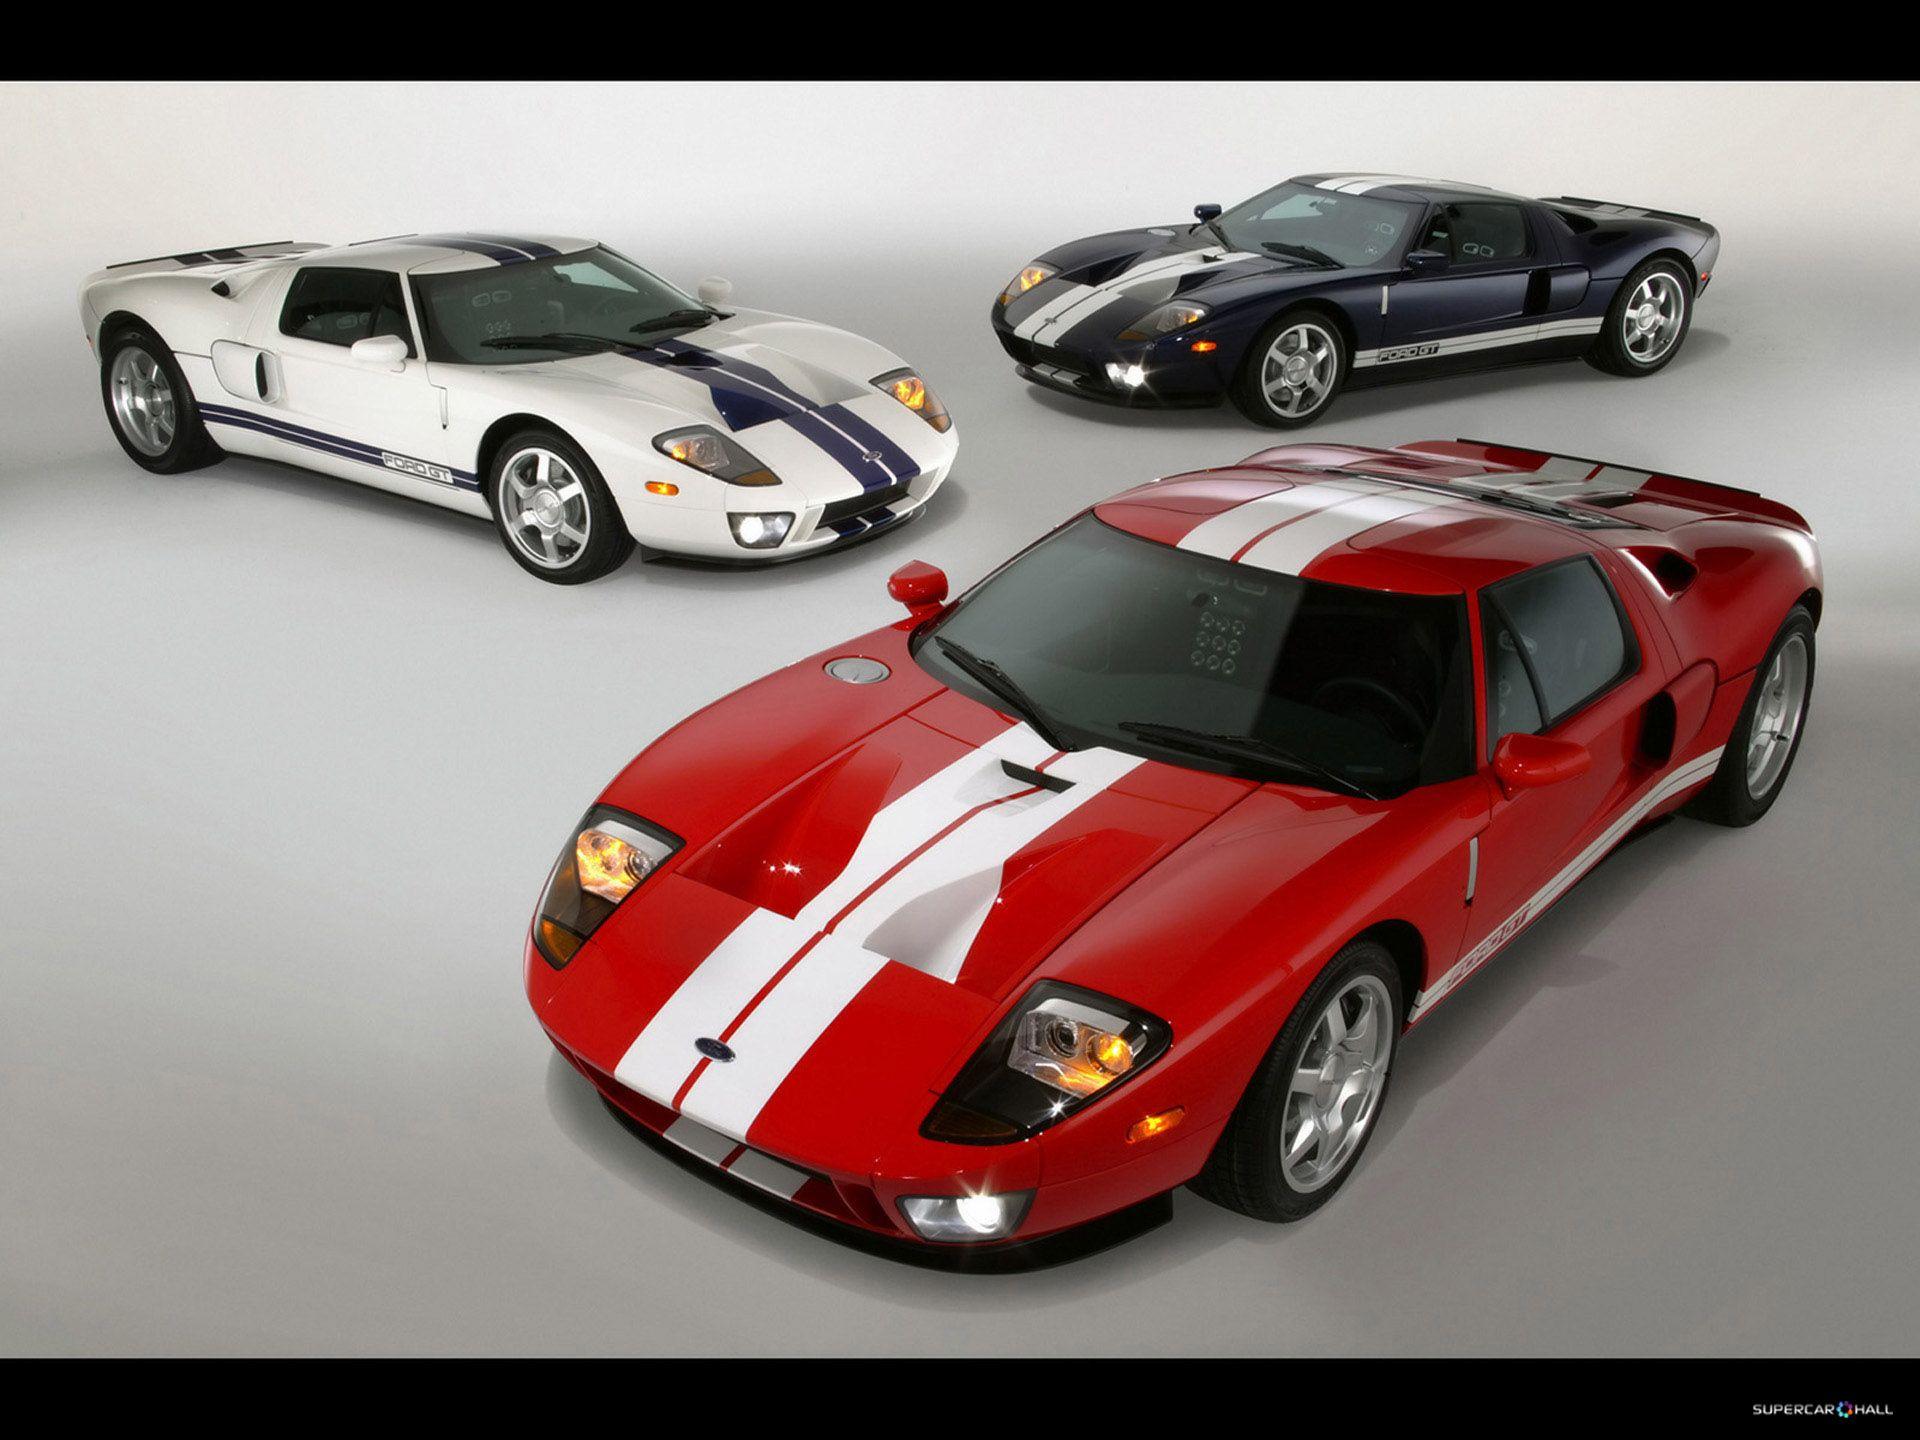 Http Www Supercarhall Com Imagens Galerias 3574 2005 Ford Gt 4